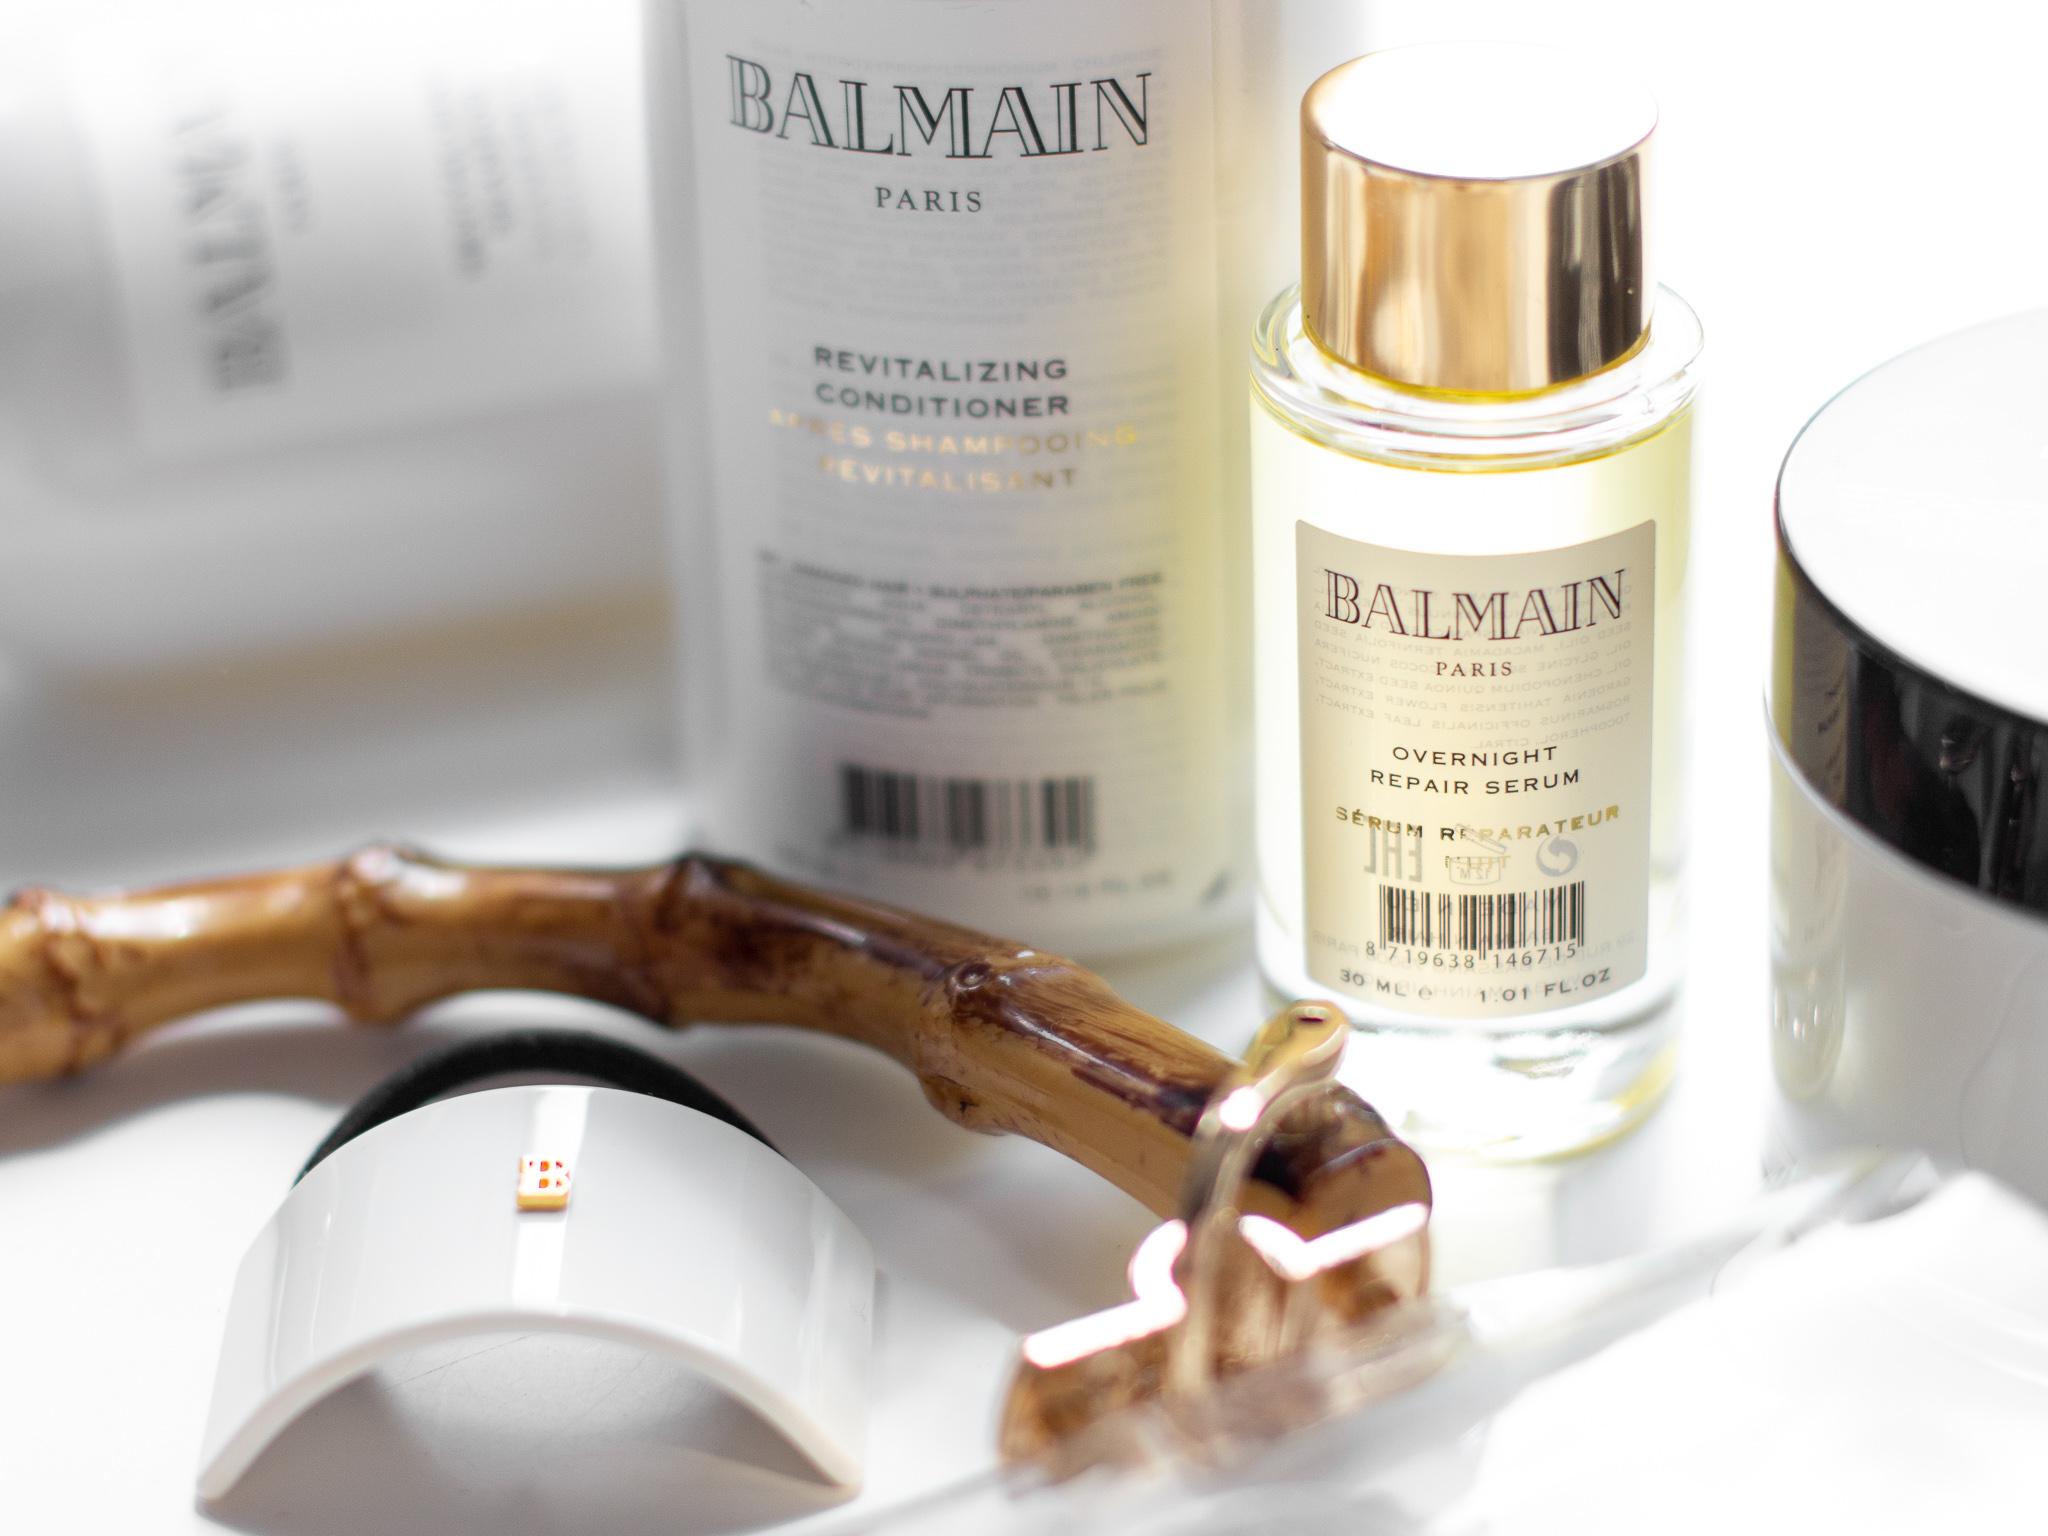 balmain overnight reapir serum recenze blog